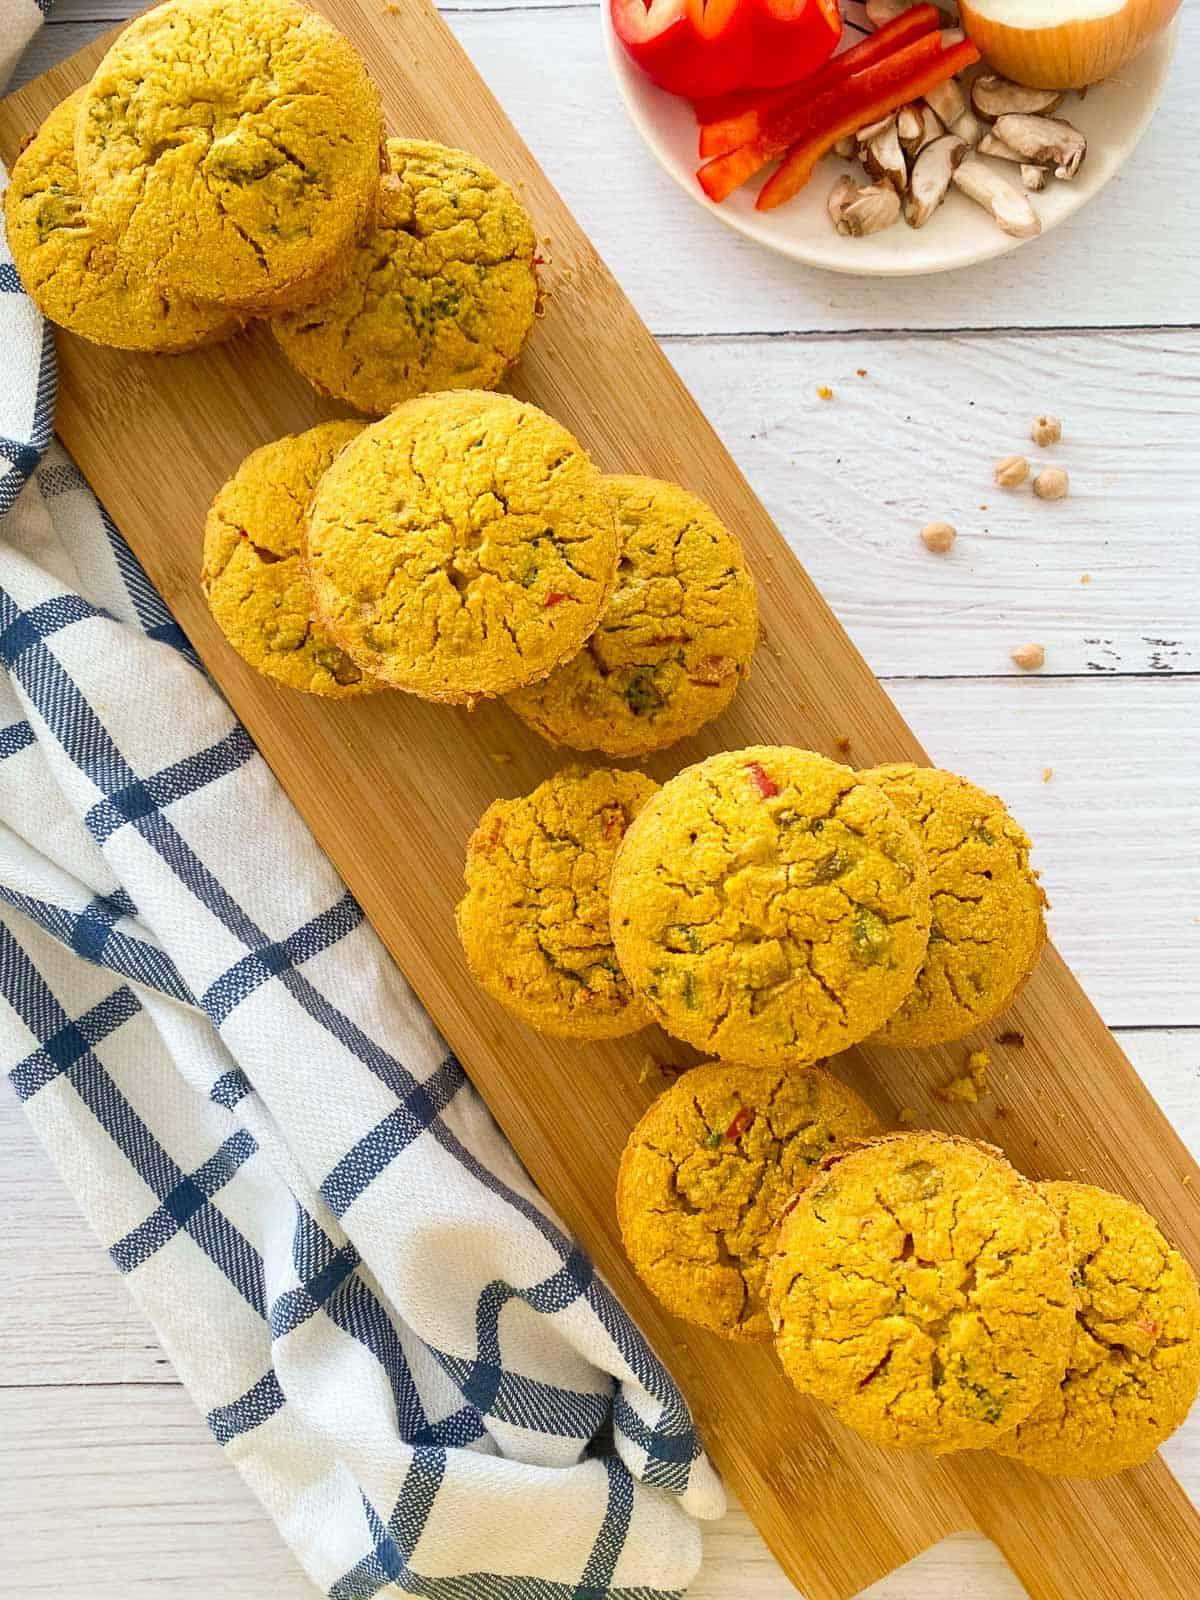 vegan frittata muffins with veggies inside sitting on wooden cutting board.